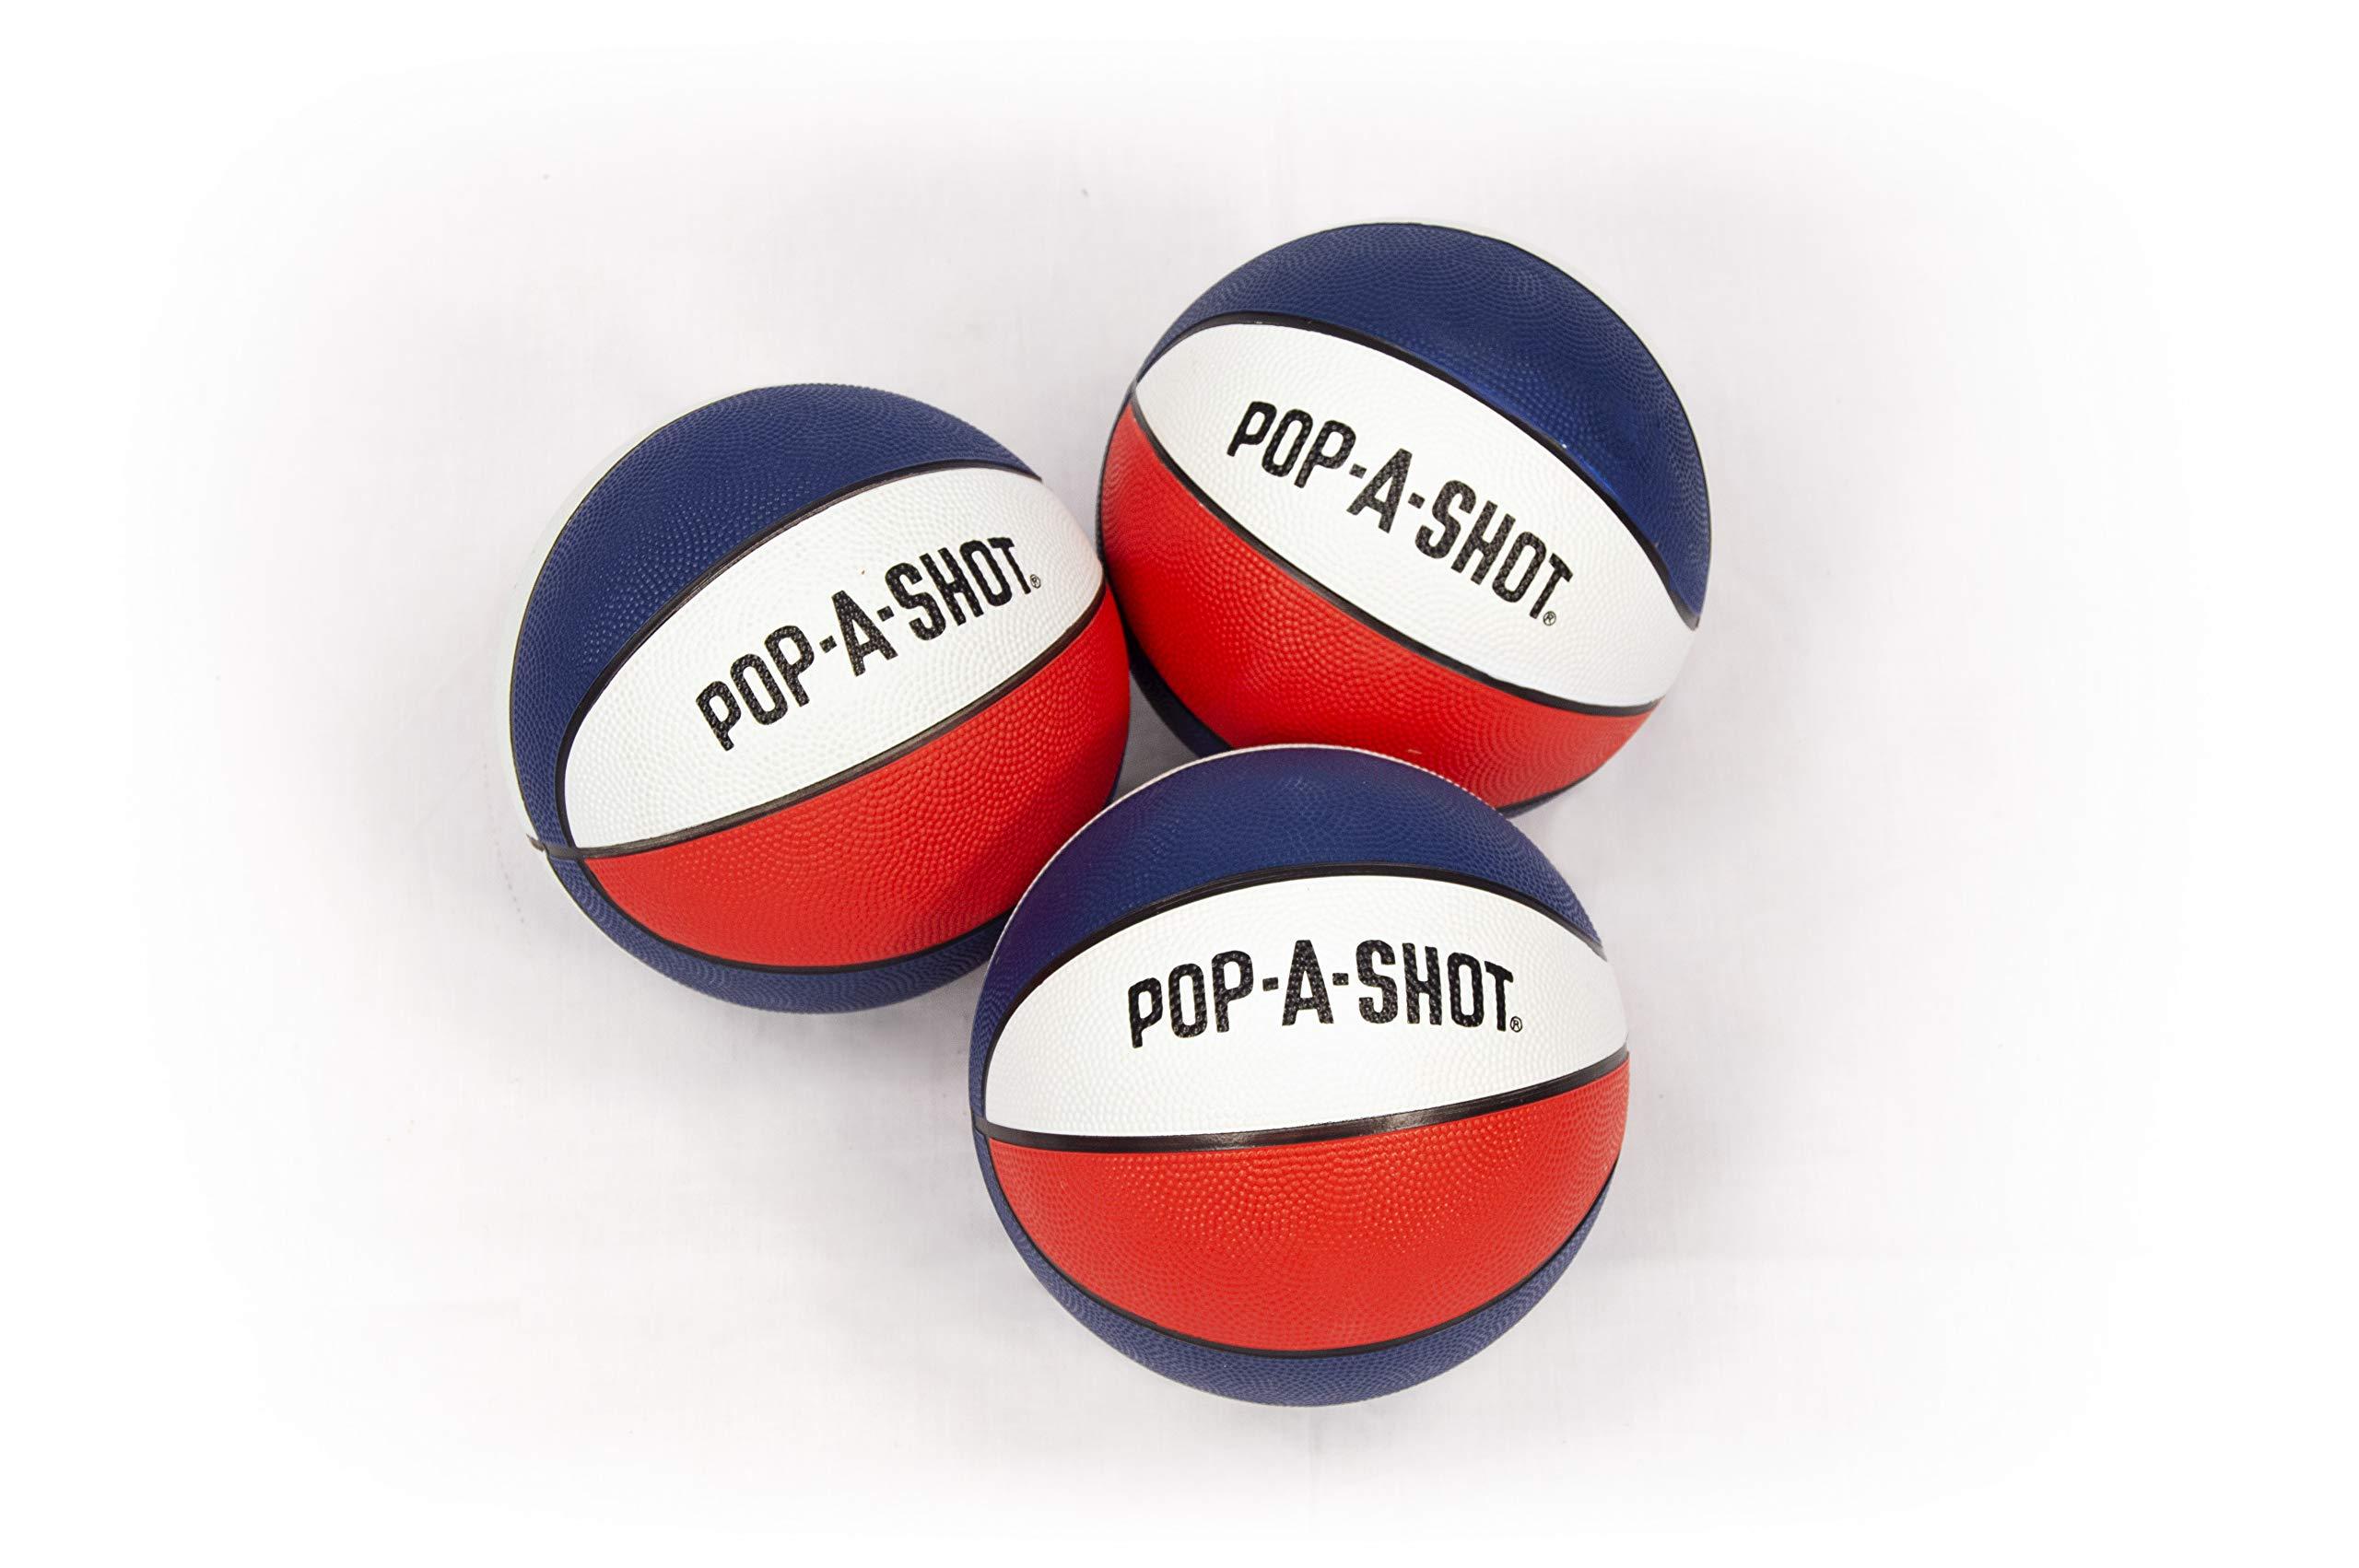 Pop-A-Shot Official Mini Basketball-Pack of 3 by Pop-A-Shot